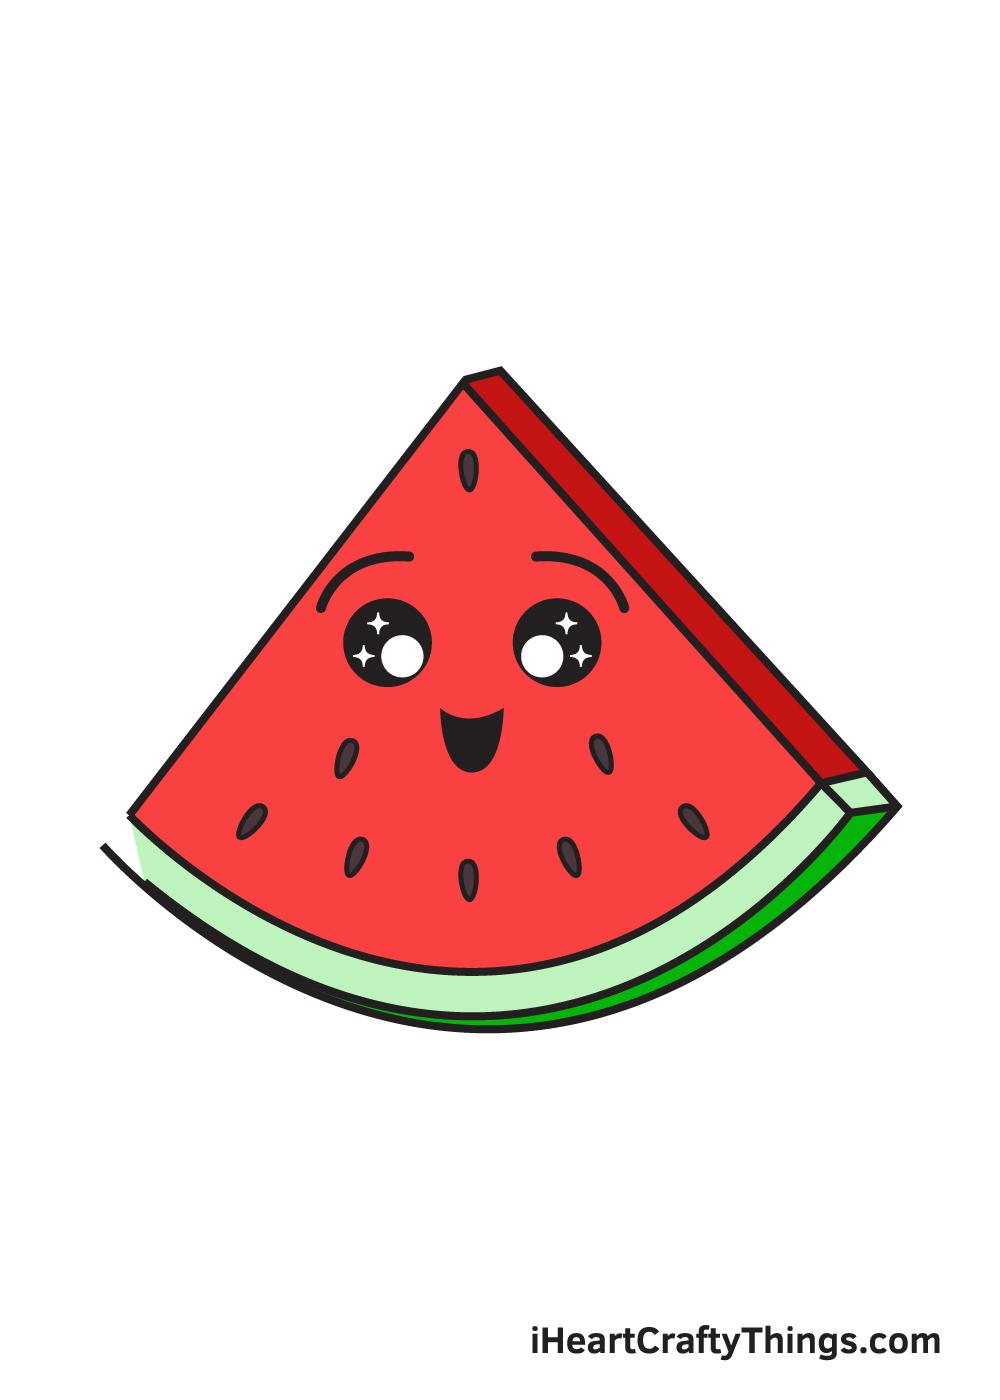 watermelon drawing 9 steps